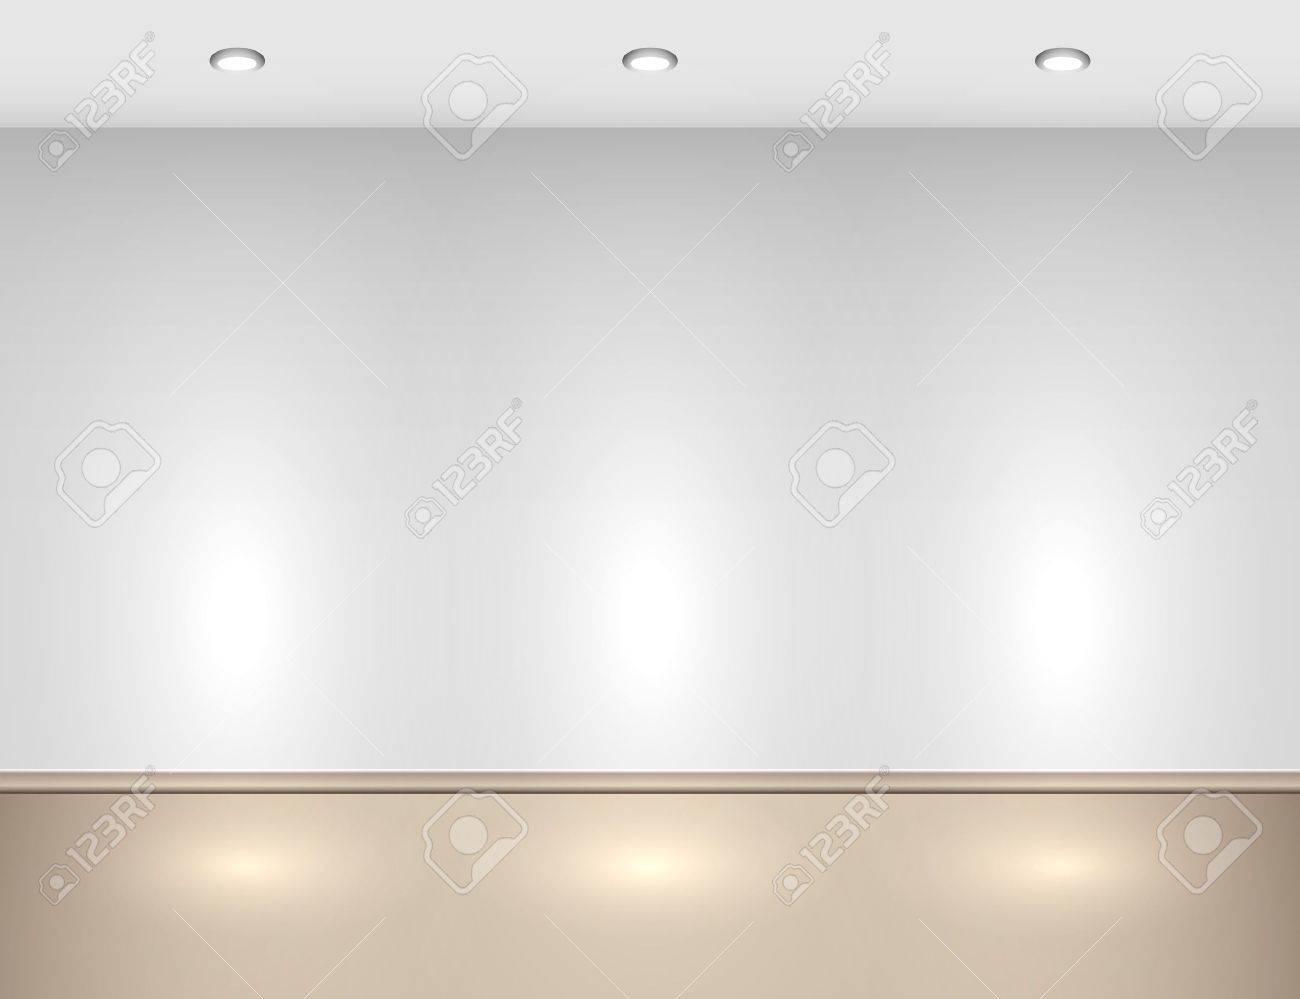 empty interior with halogen lamps stock vector 14433072